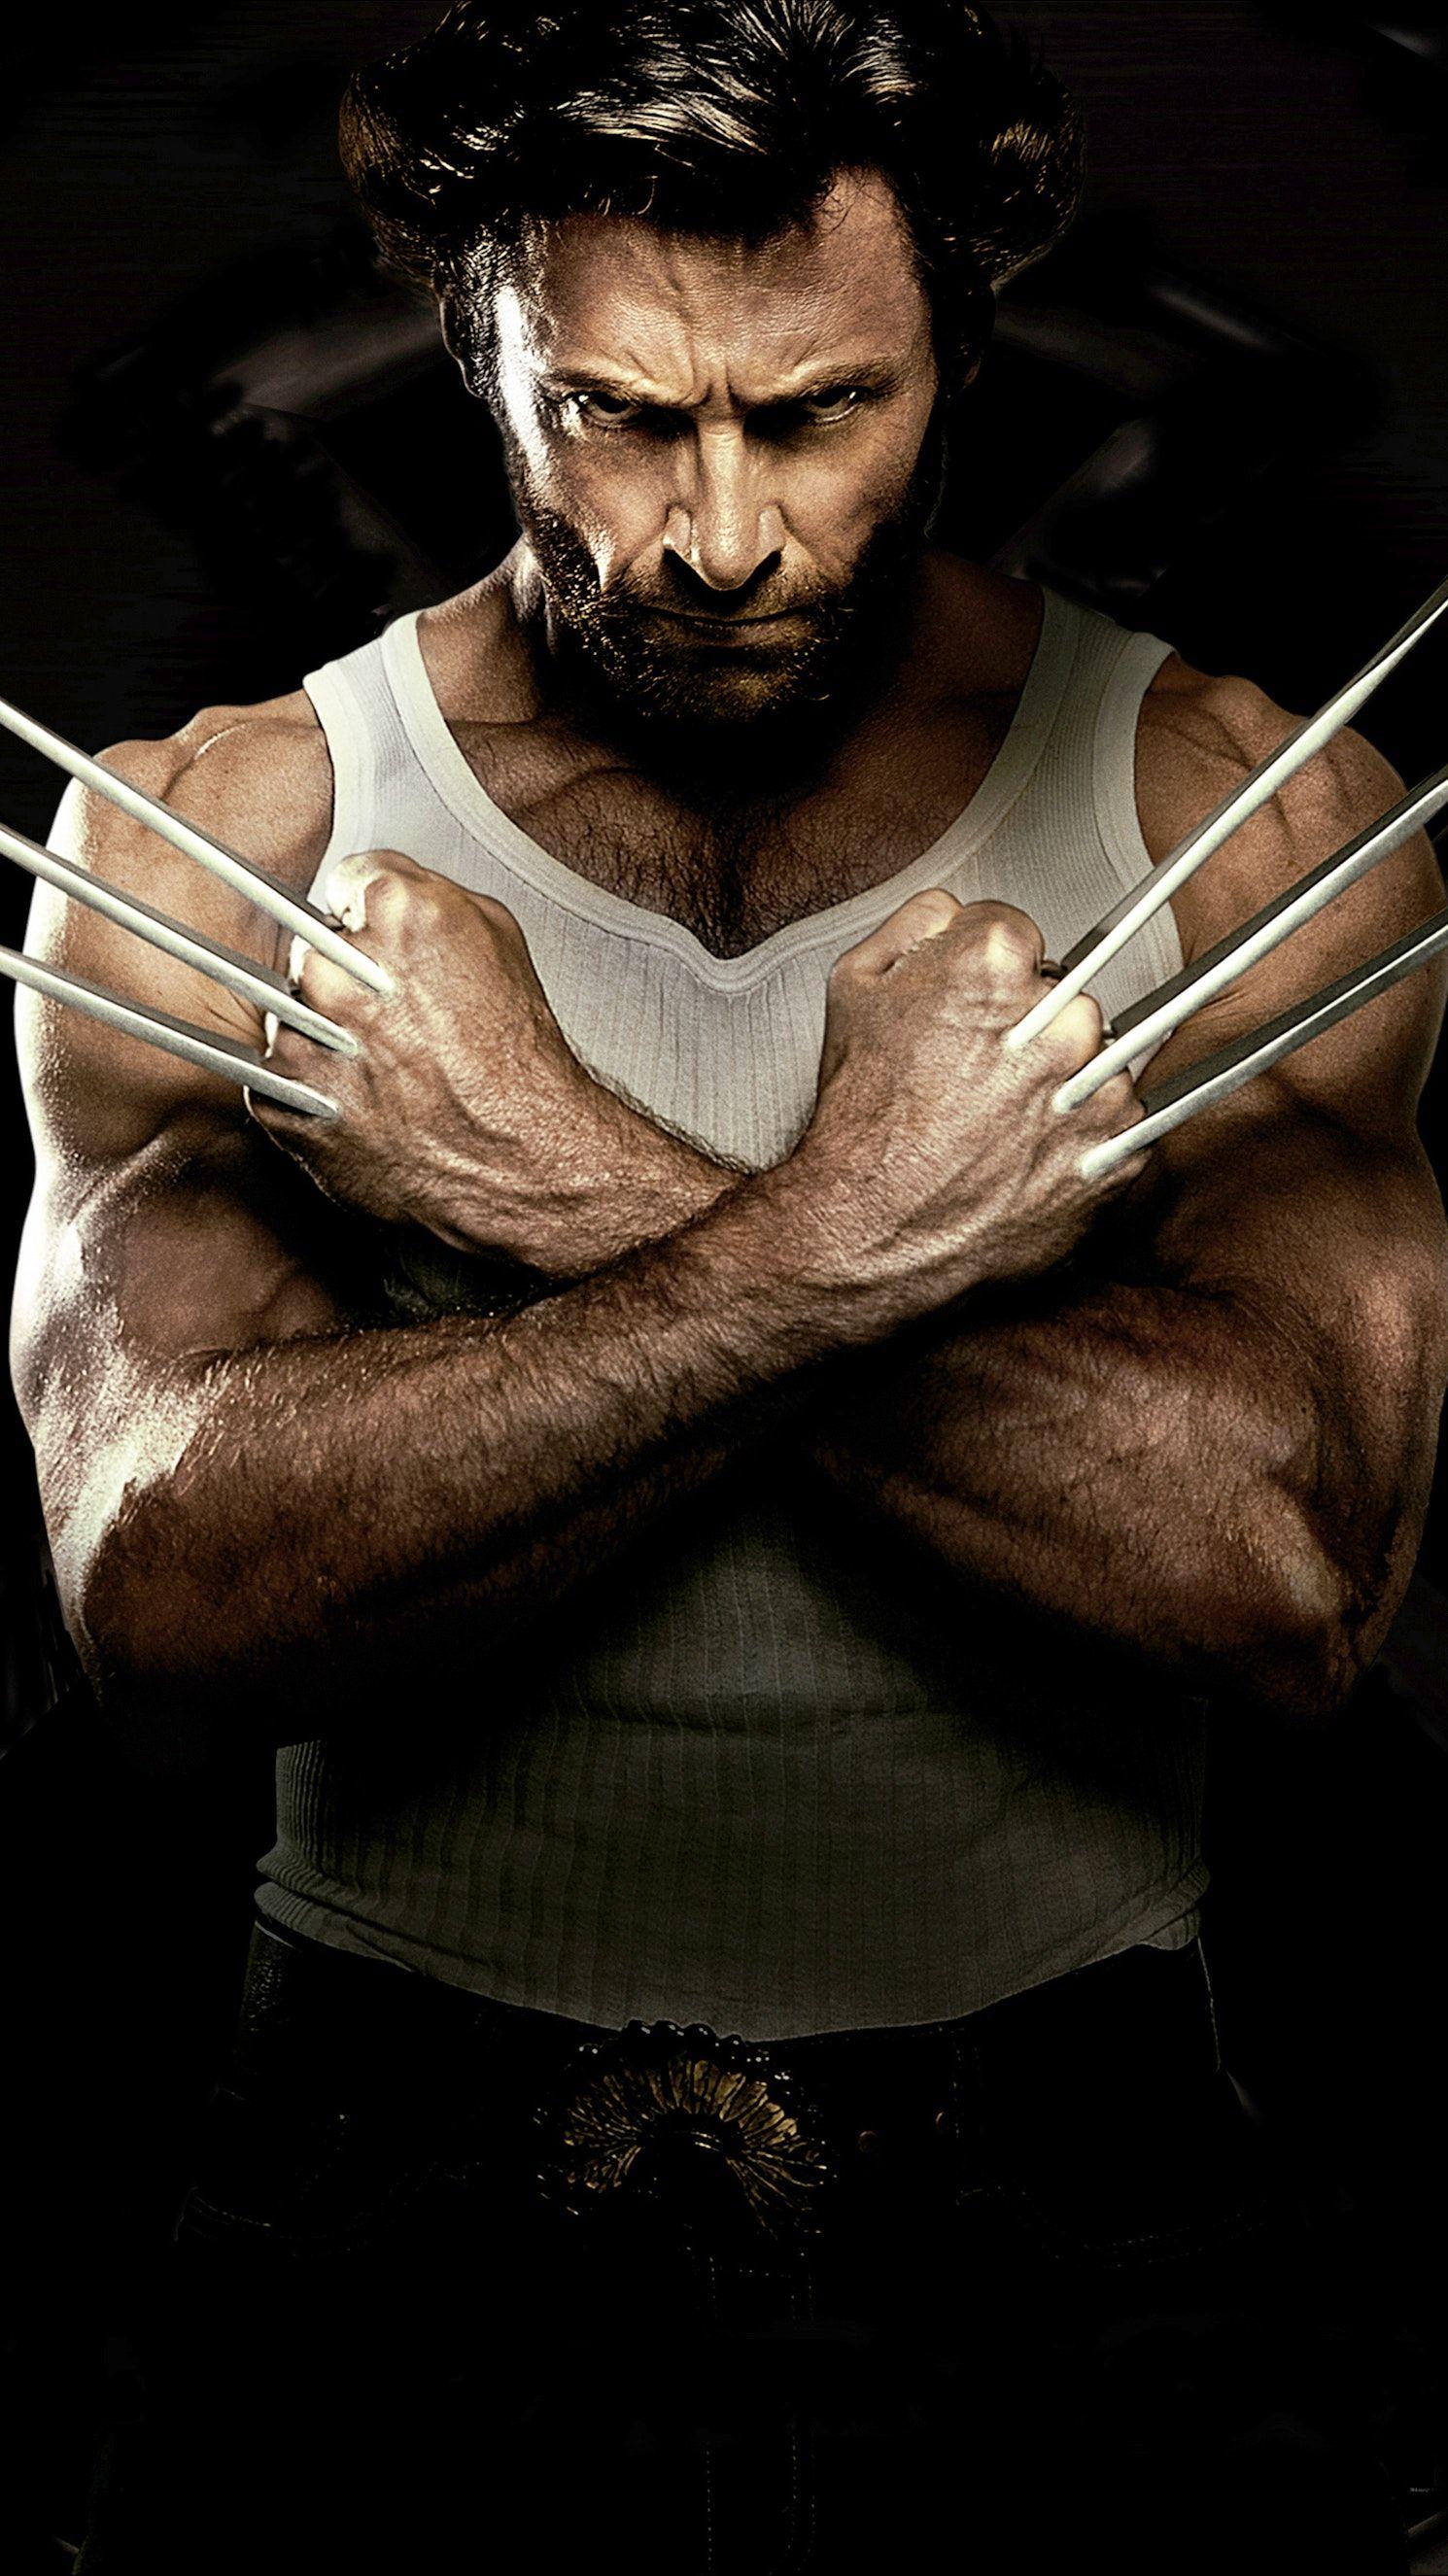 X Men Origins Wolverine 2009 Phone Wallpaper Moviemania Phone Wallpaper For Men Android Wallpaper Wolverine